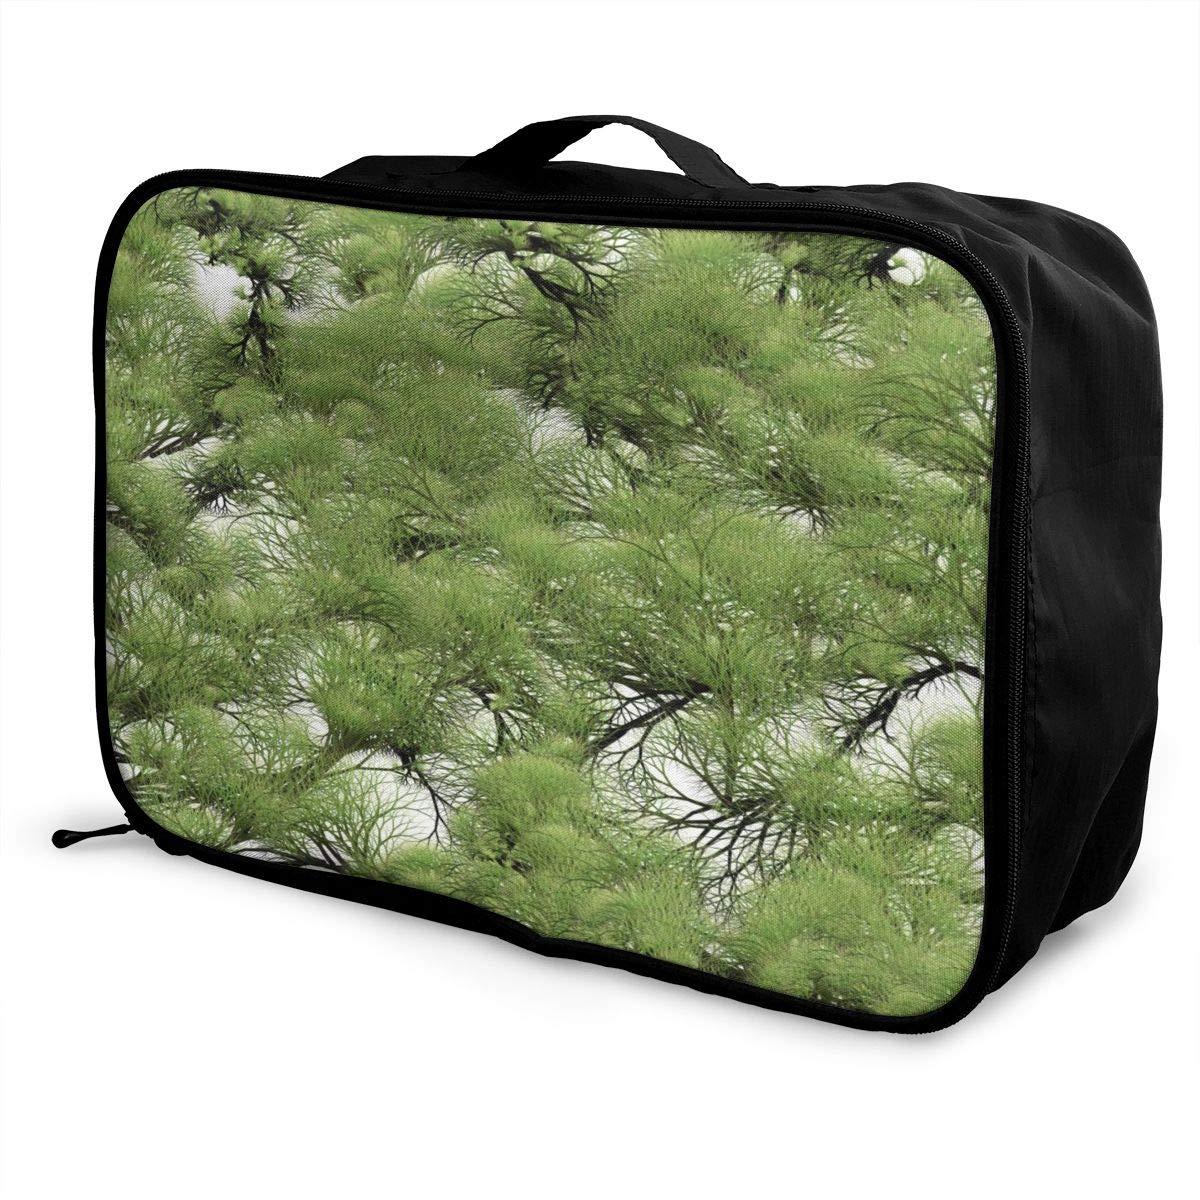 Travel Luggage Duffle Bag Lightweight Portable Handbag Trees Paint Large Capacity Waterproof Foldable Storage Tote